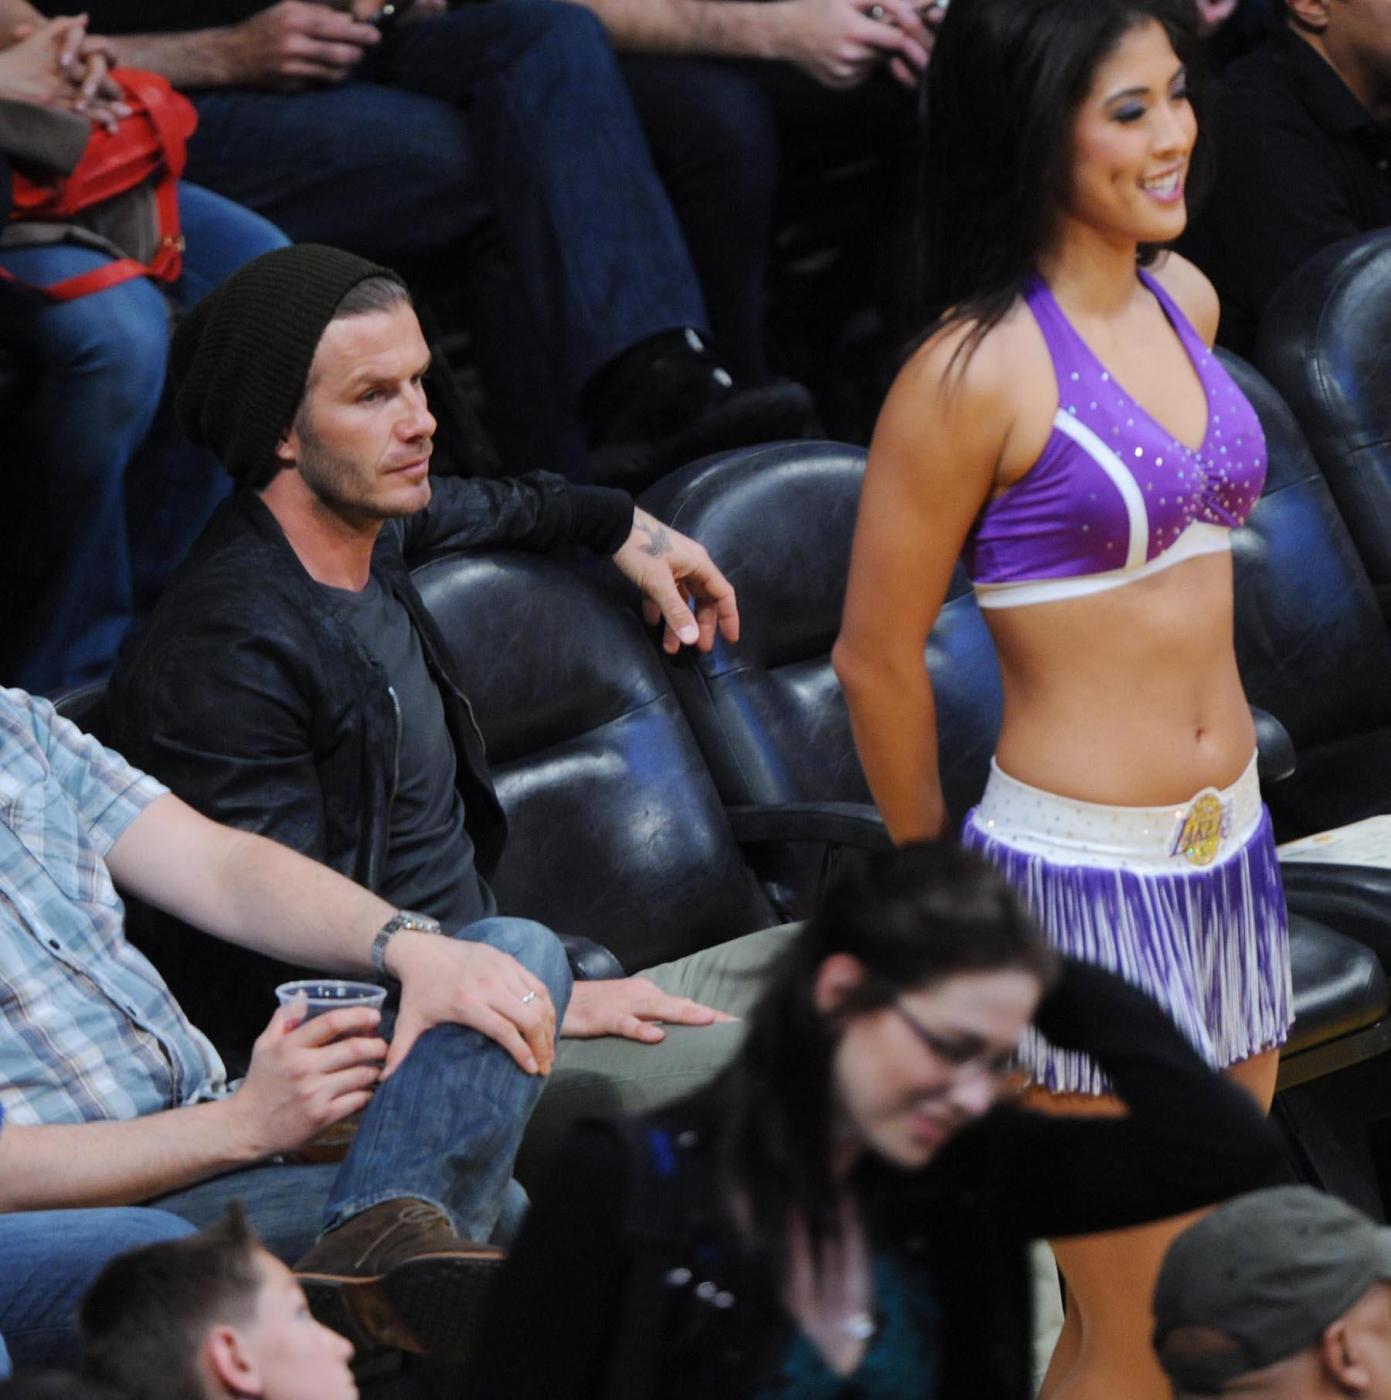 David Beckham alla partita Los Angeles Lakers vs. Boston Celtics008